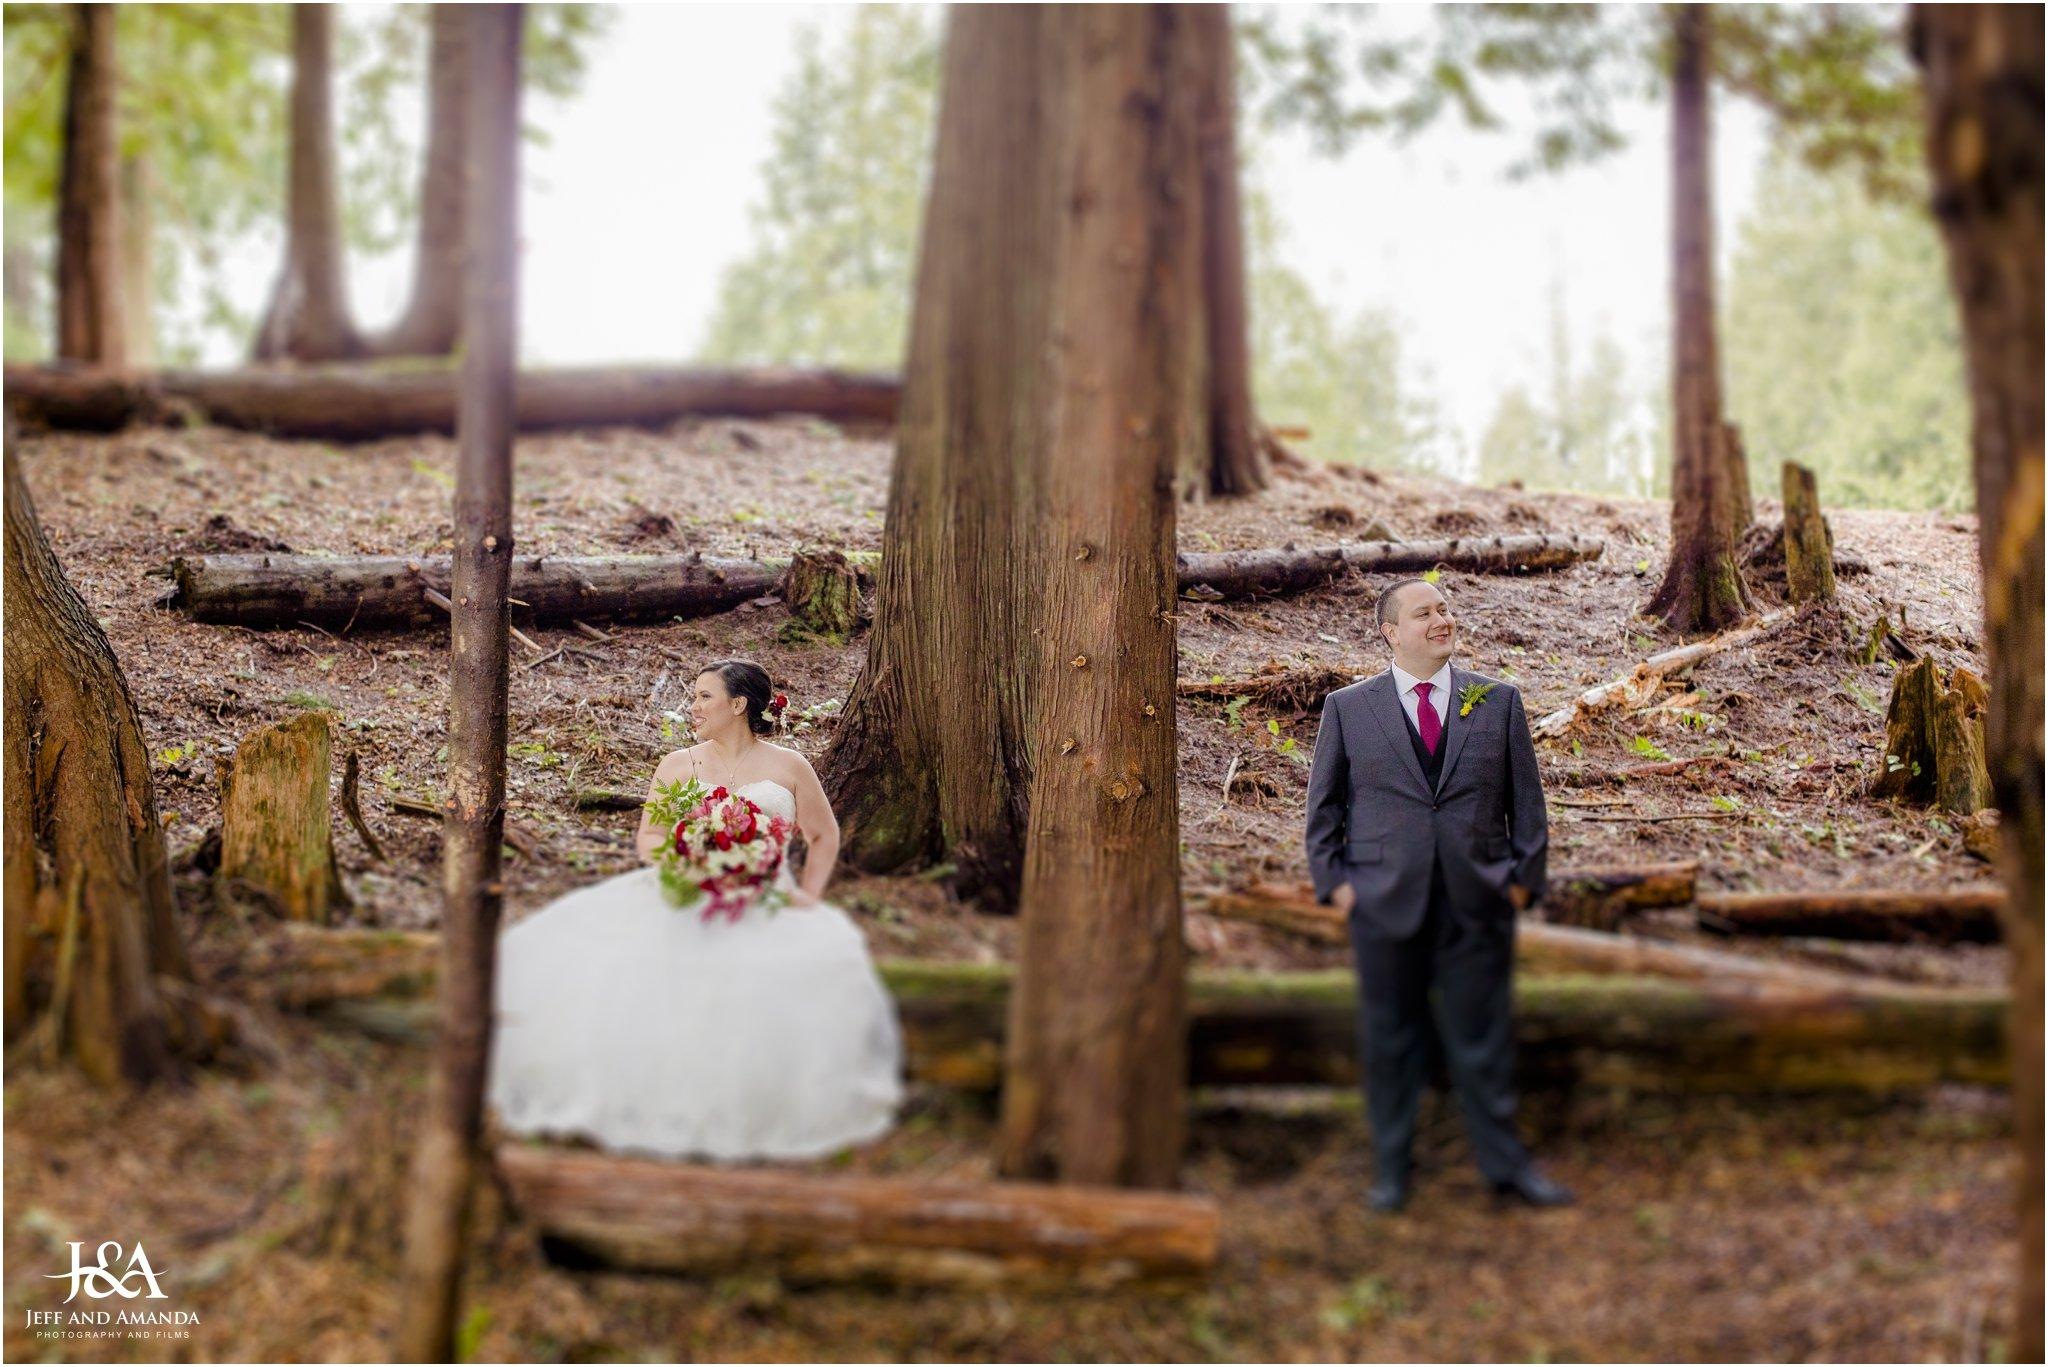 Dave and Kari s Wedding-Facebook Ready-0160.jpg